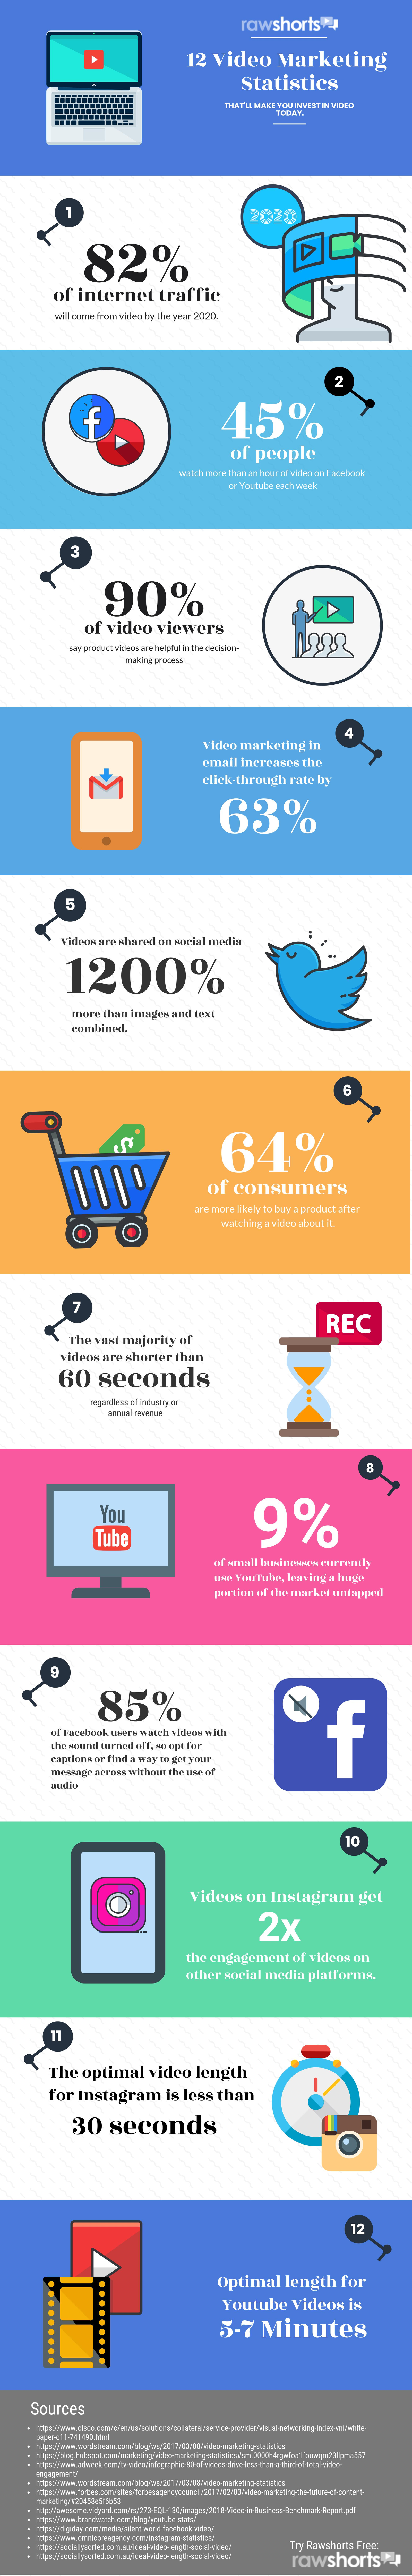 12 Video Marketing Metrics that prove video works